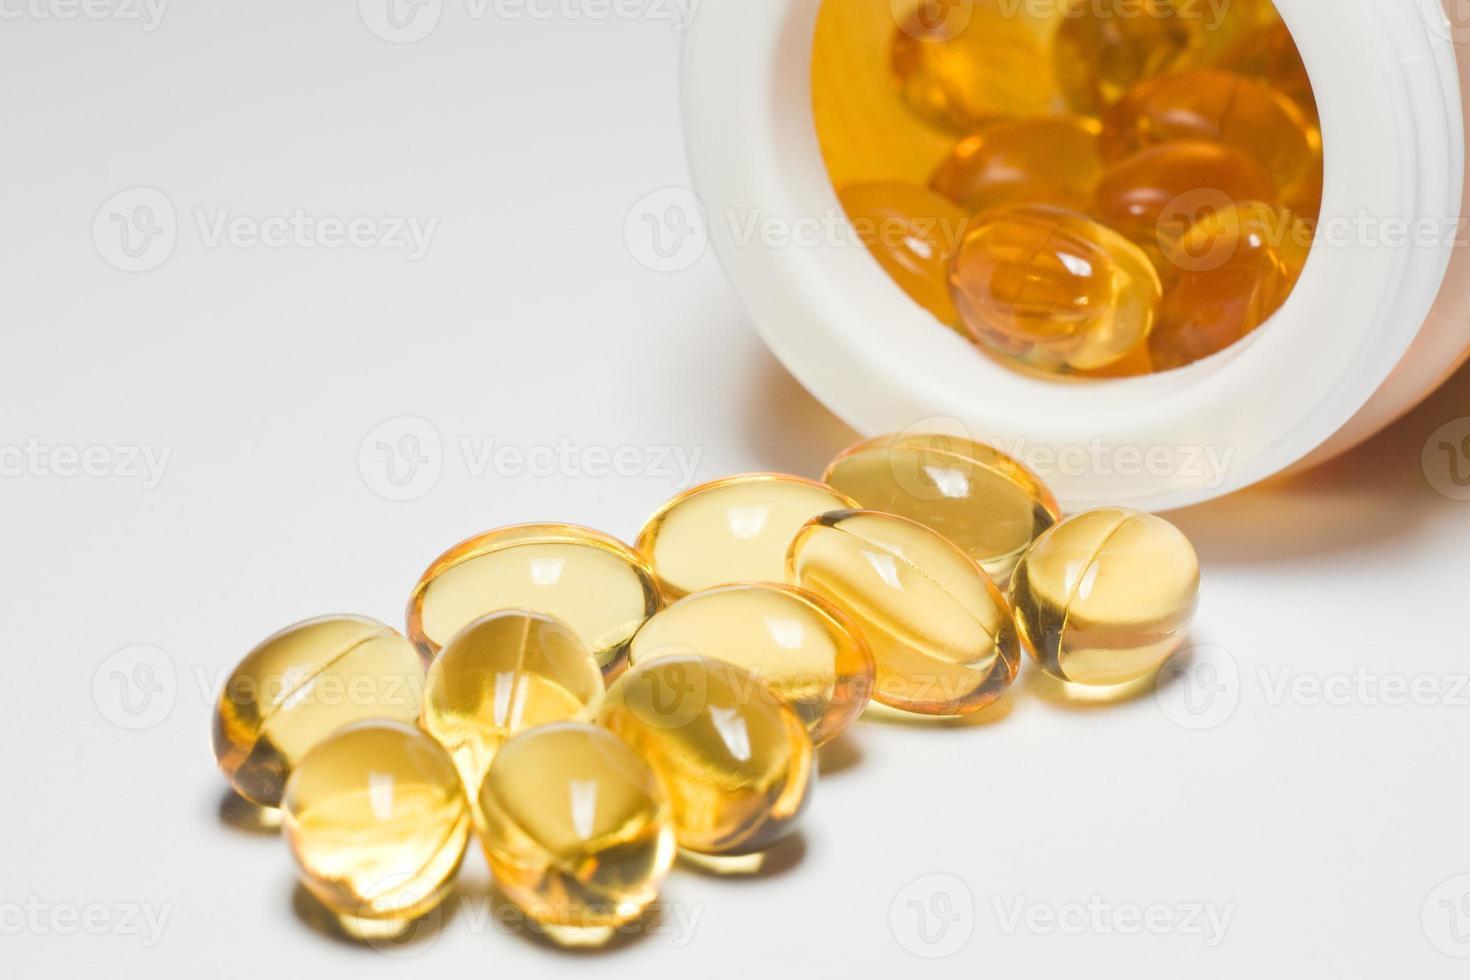 vitamine foto